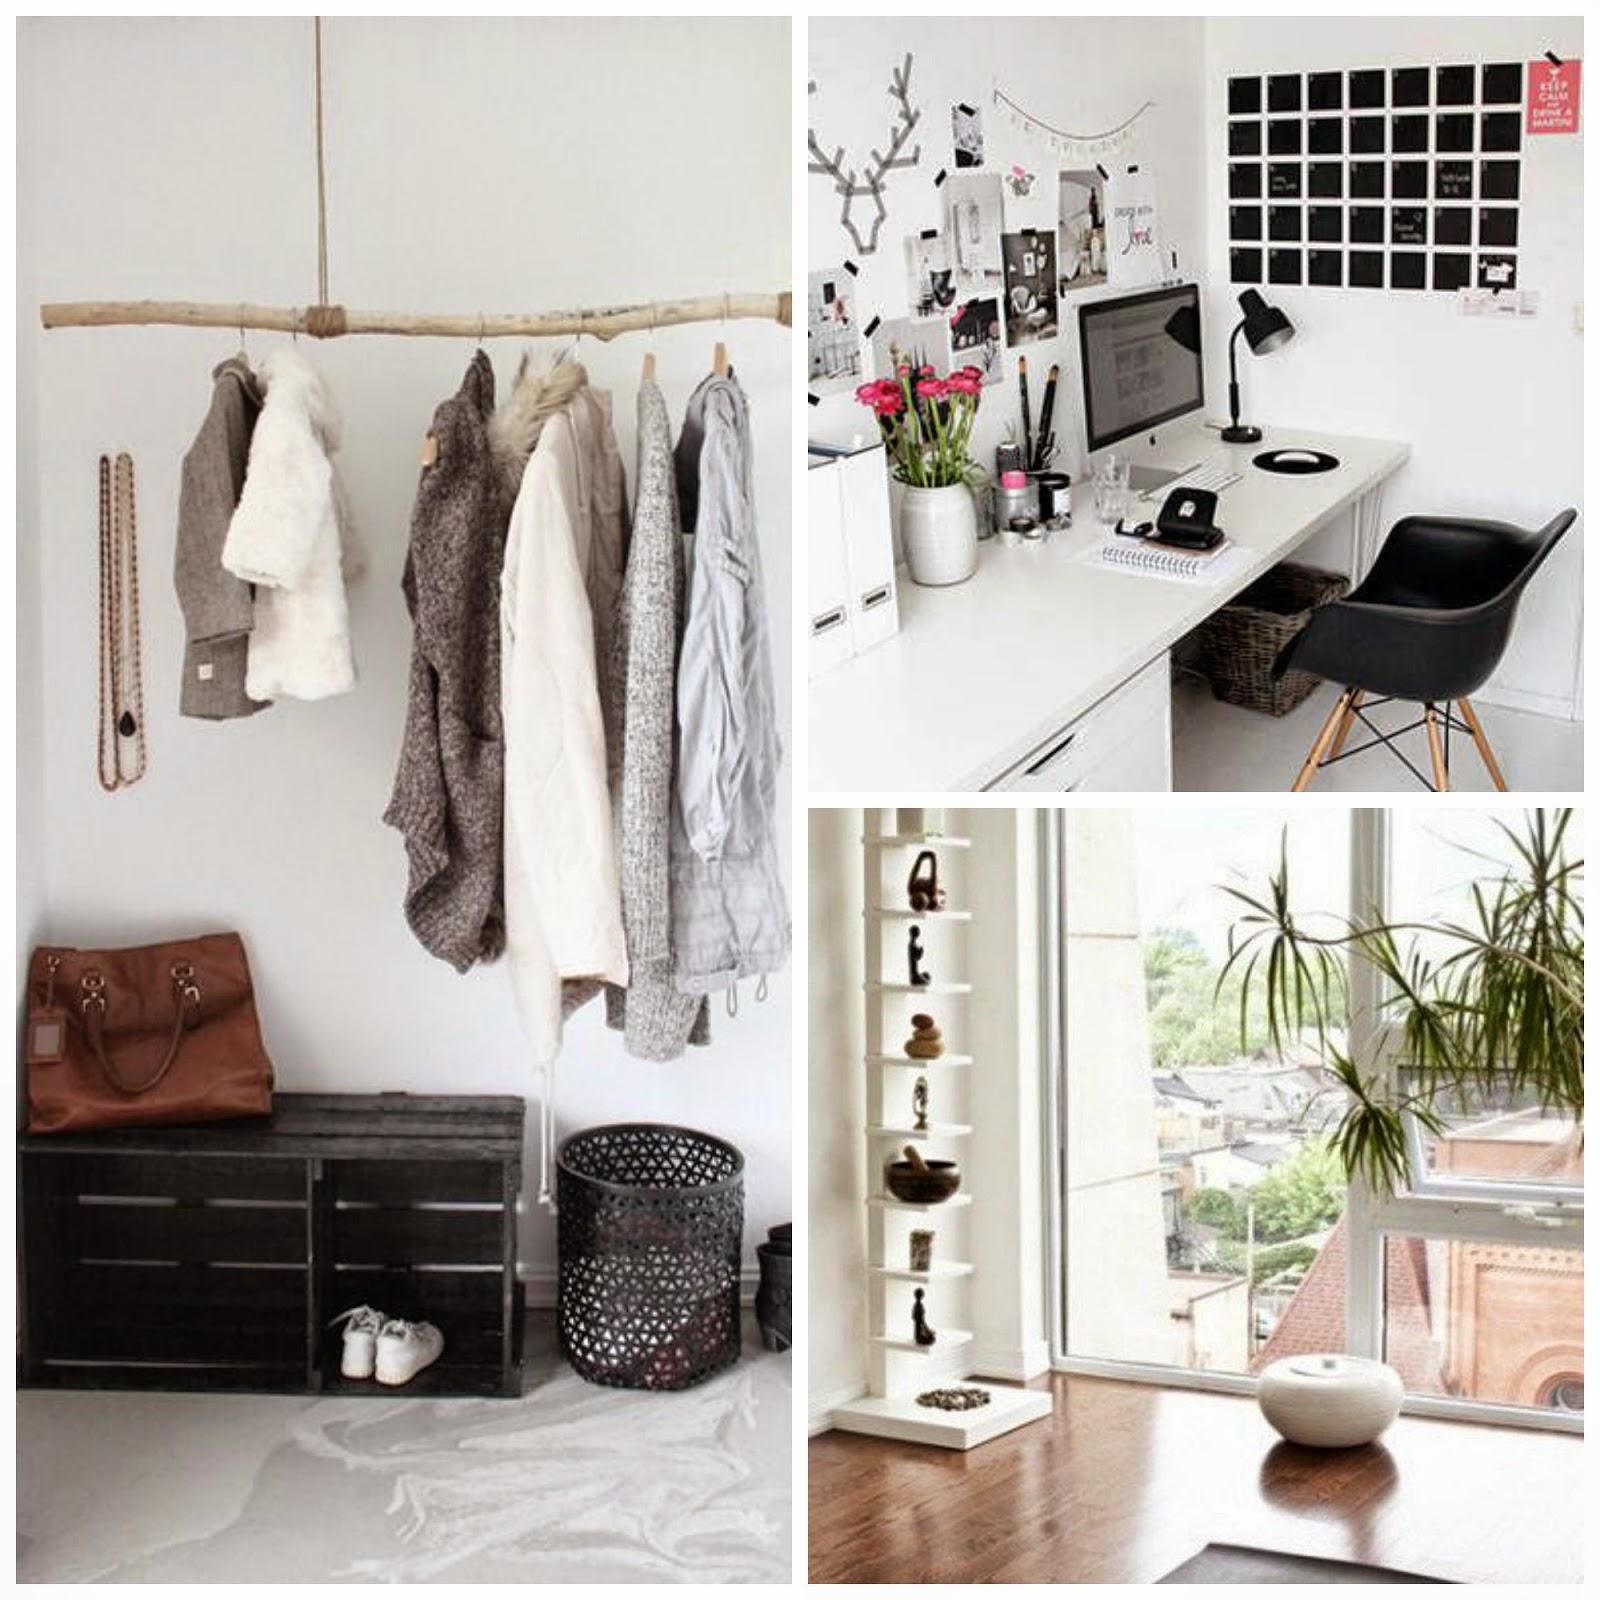 Ideeen interieur idee n kamer inrichten idee n kinderkamer ideeen slaapkamer idee n - Kleur kamer volwassene idee foto ...